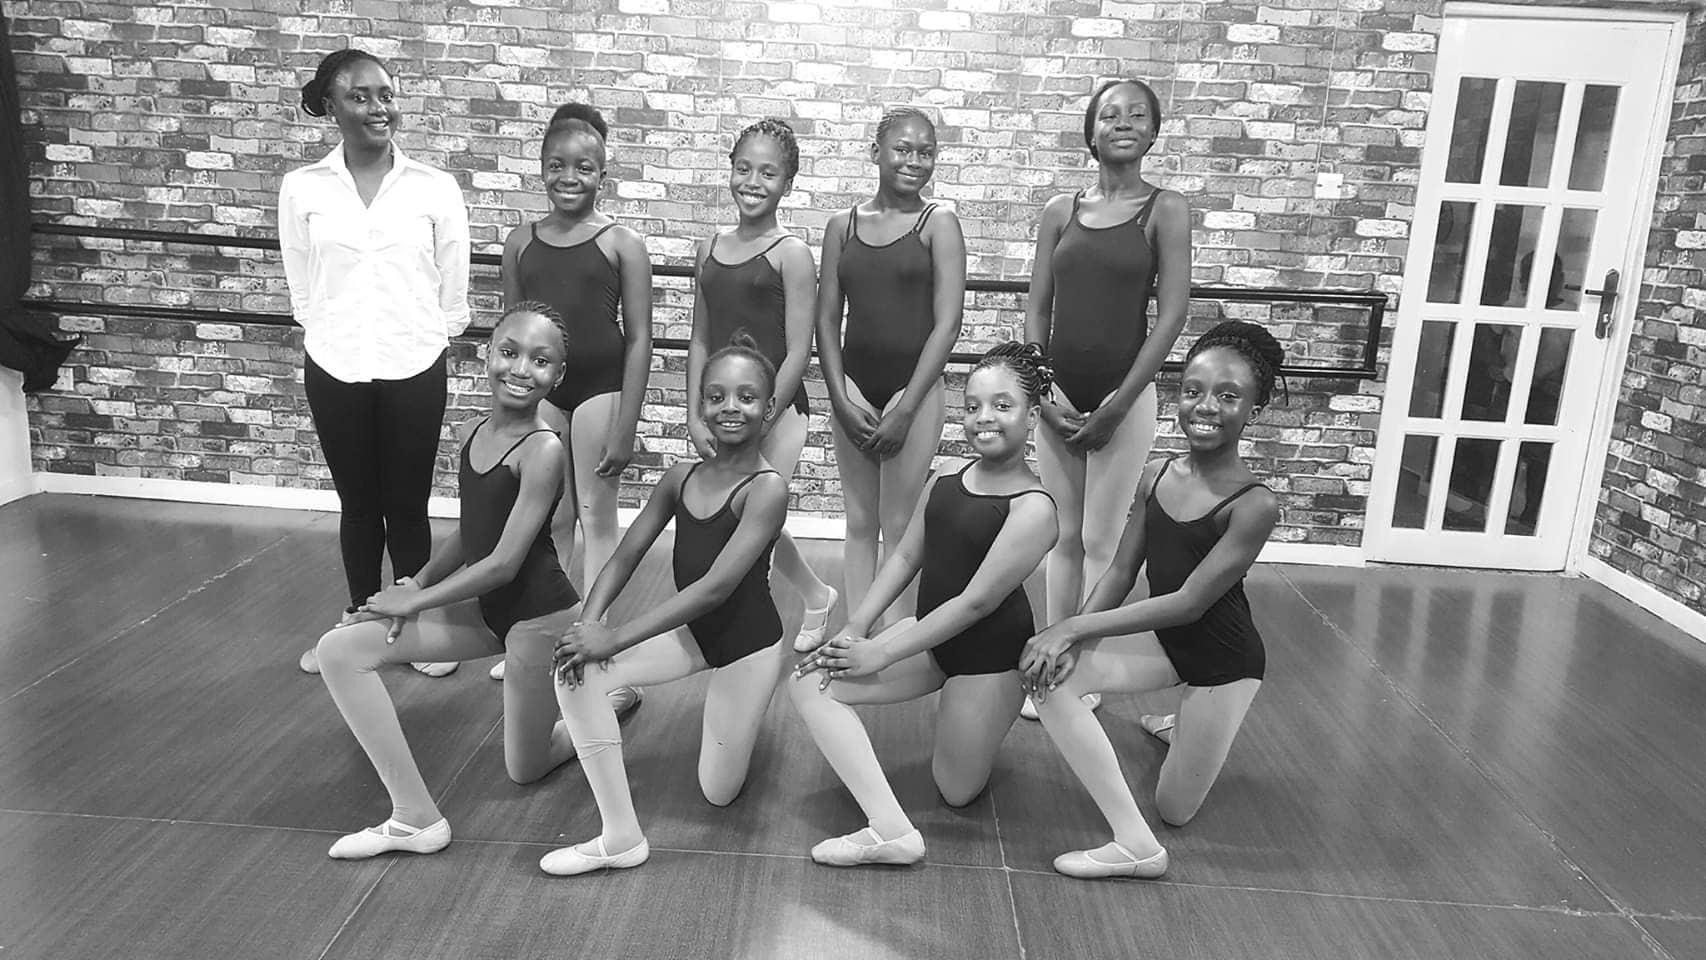 Esther Oladipupo with students in Nigeria. Photo courtesy of Kingdom Ballet Company